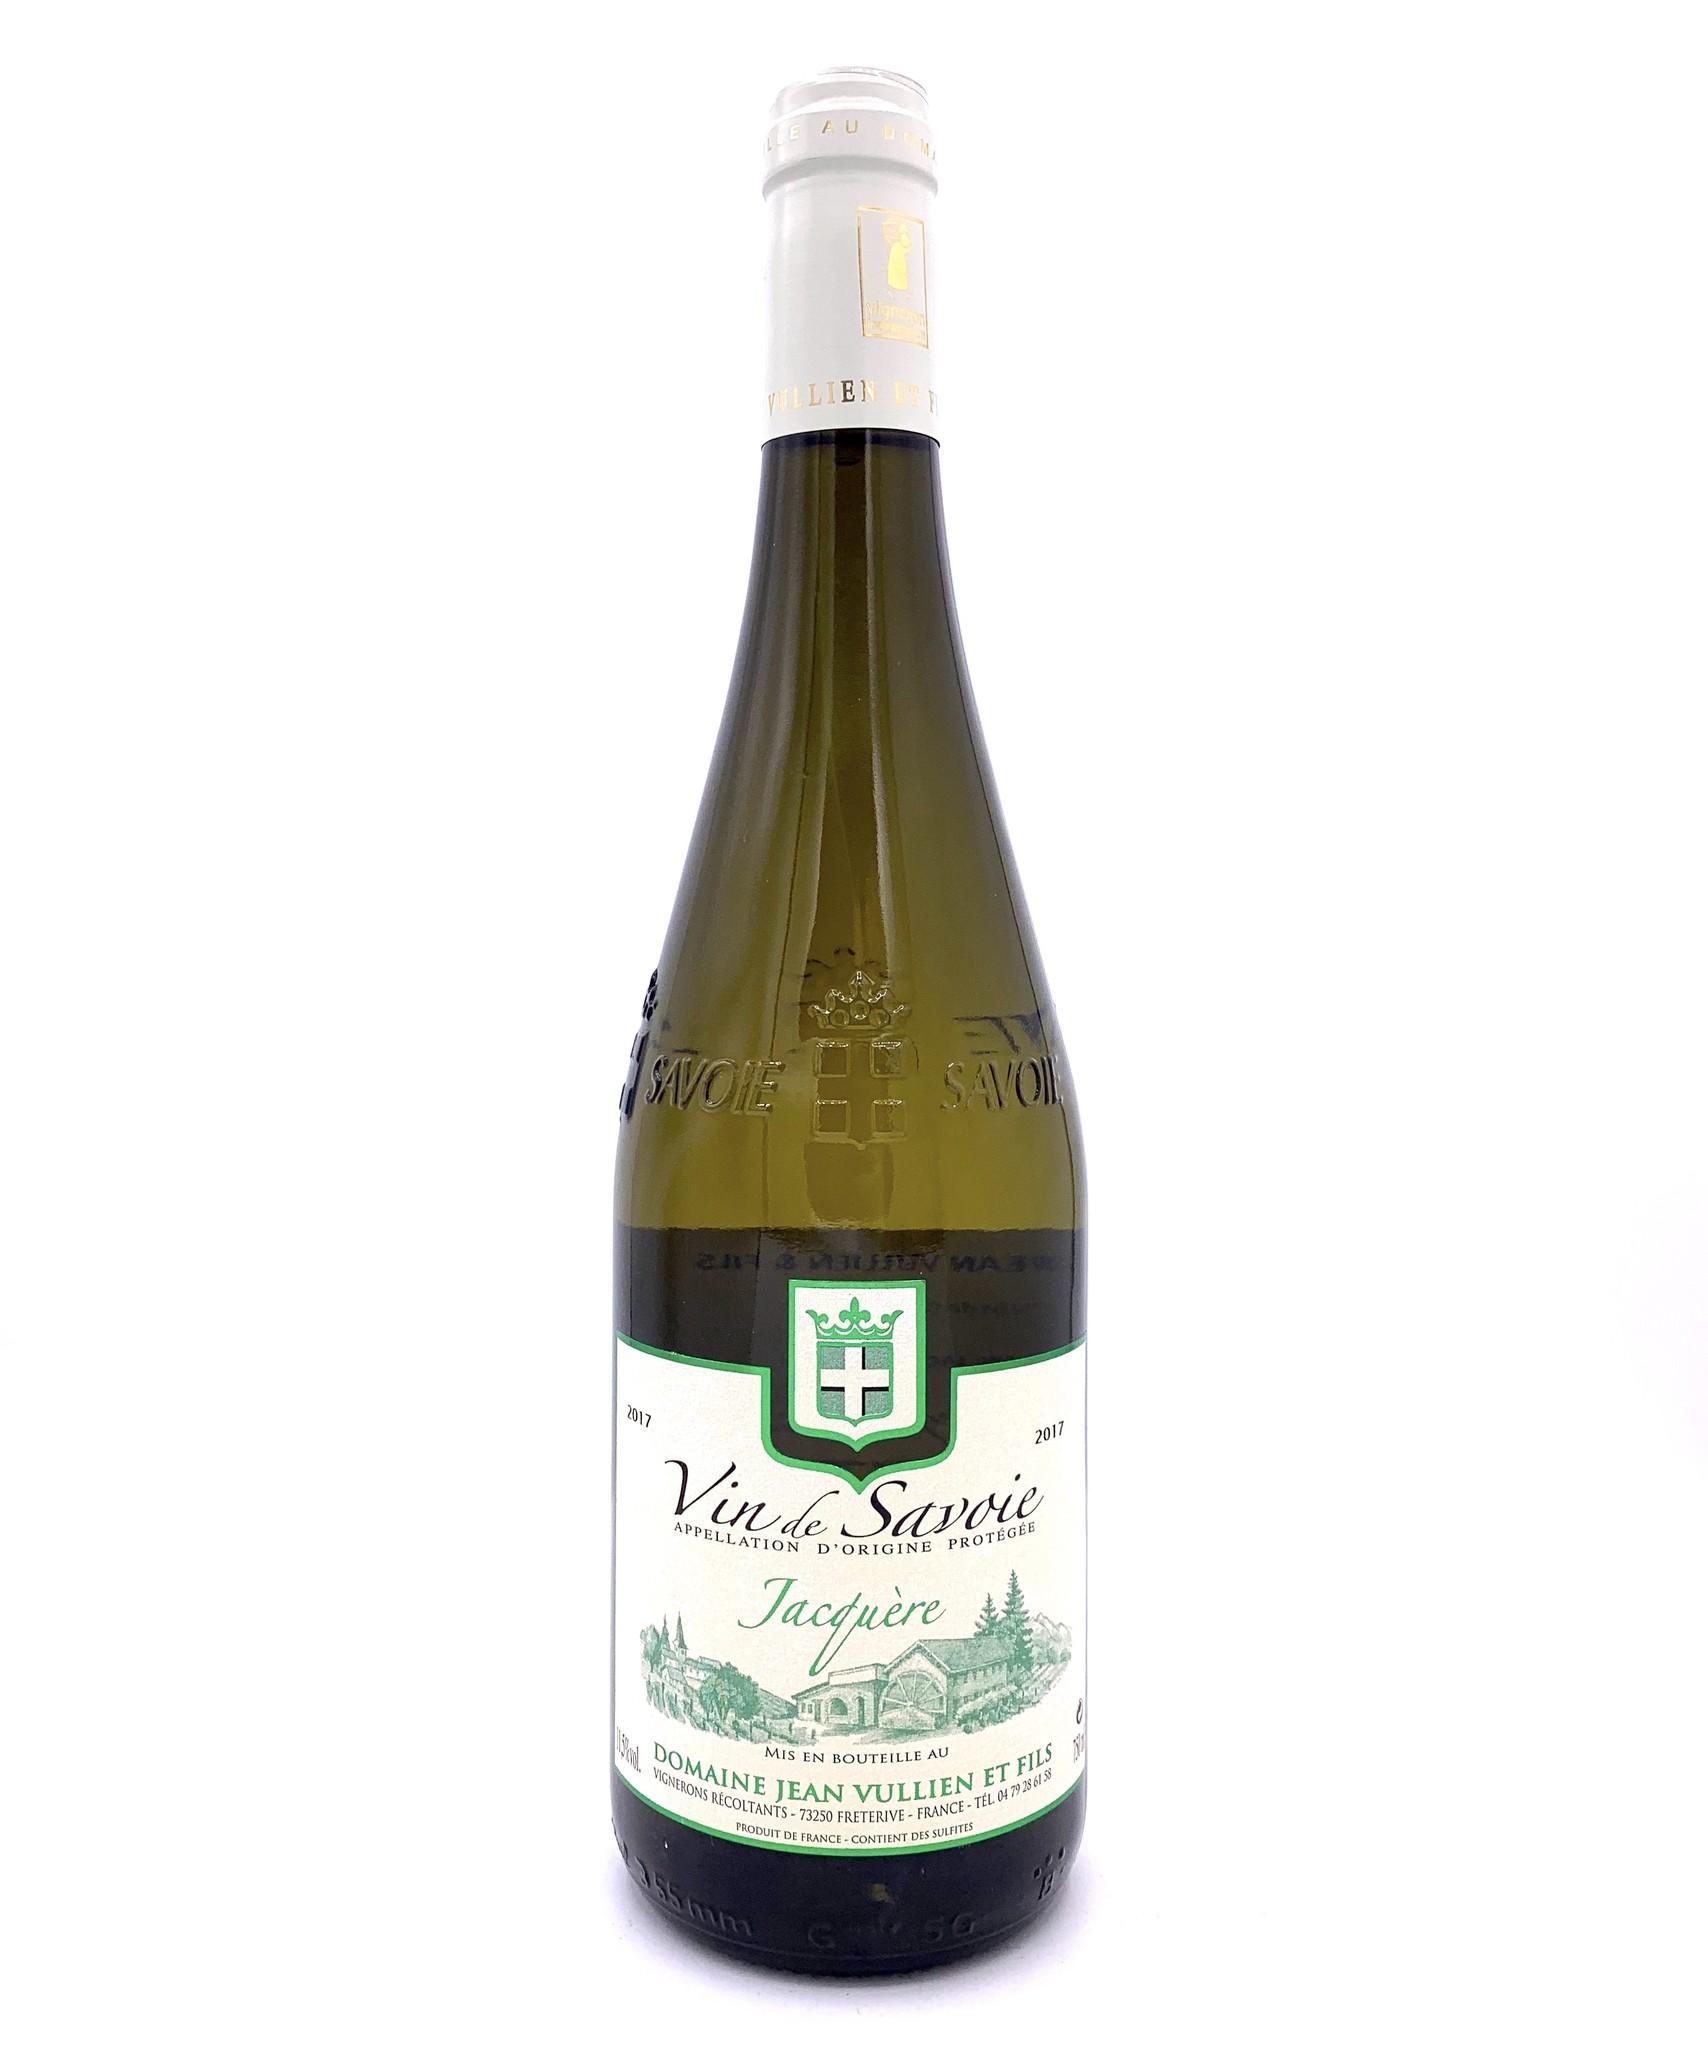 Vin de Savoie 2018 Jean Vullien